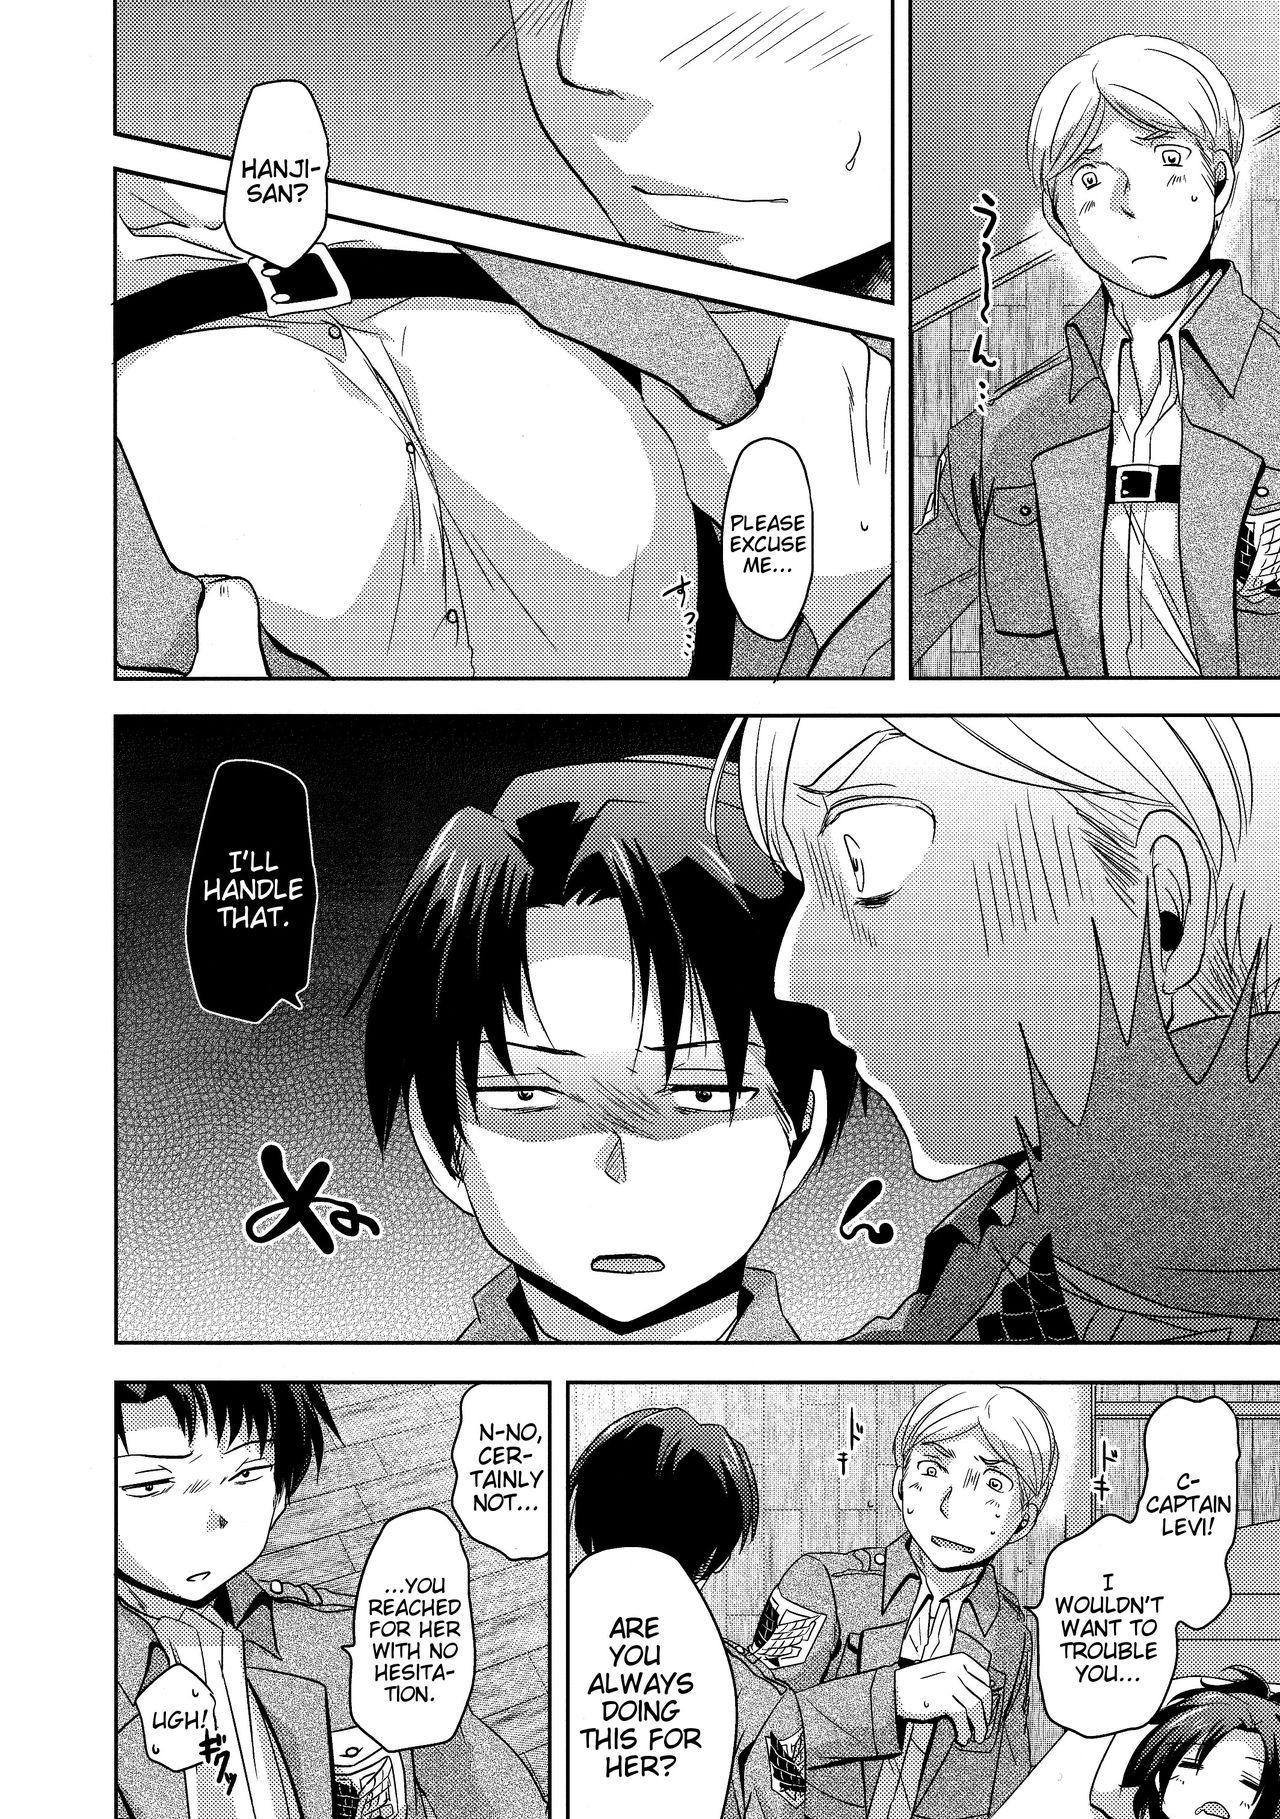 Shikkari shite kudasai Buntaichou. | Please take this seriously, Squad Leader. 5